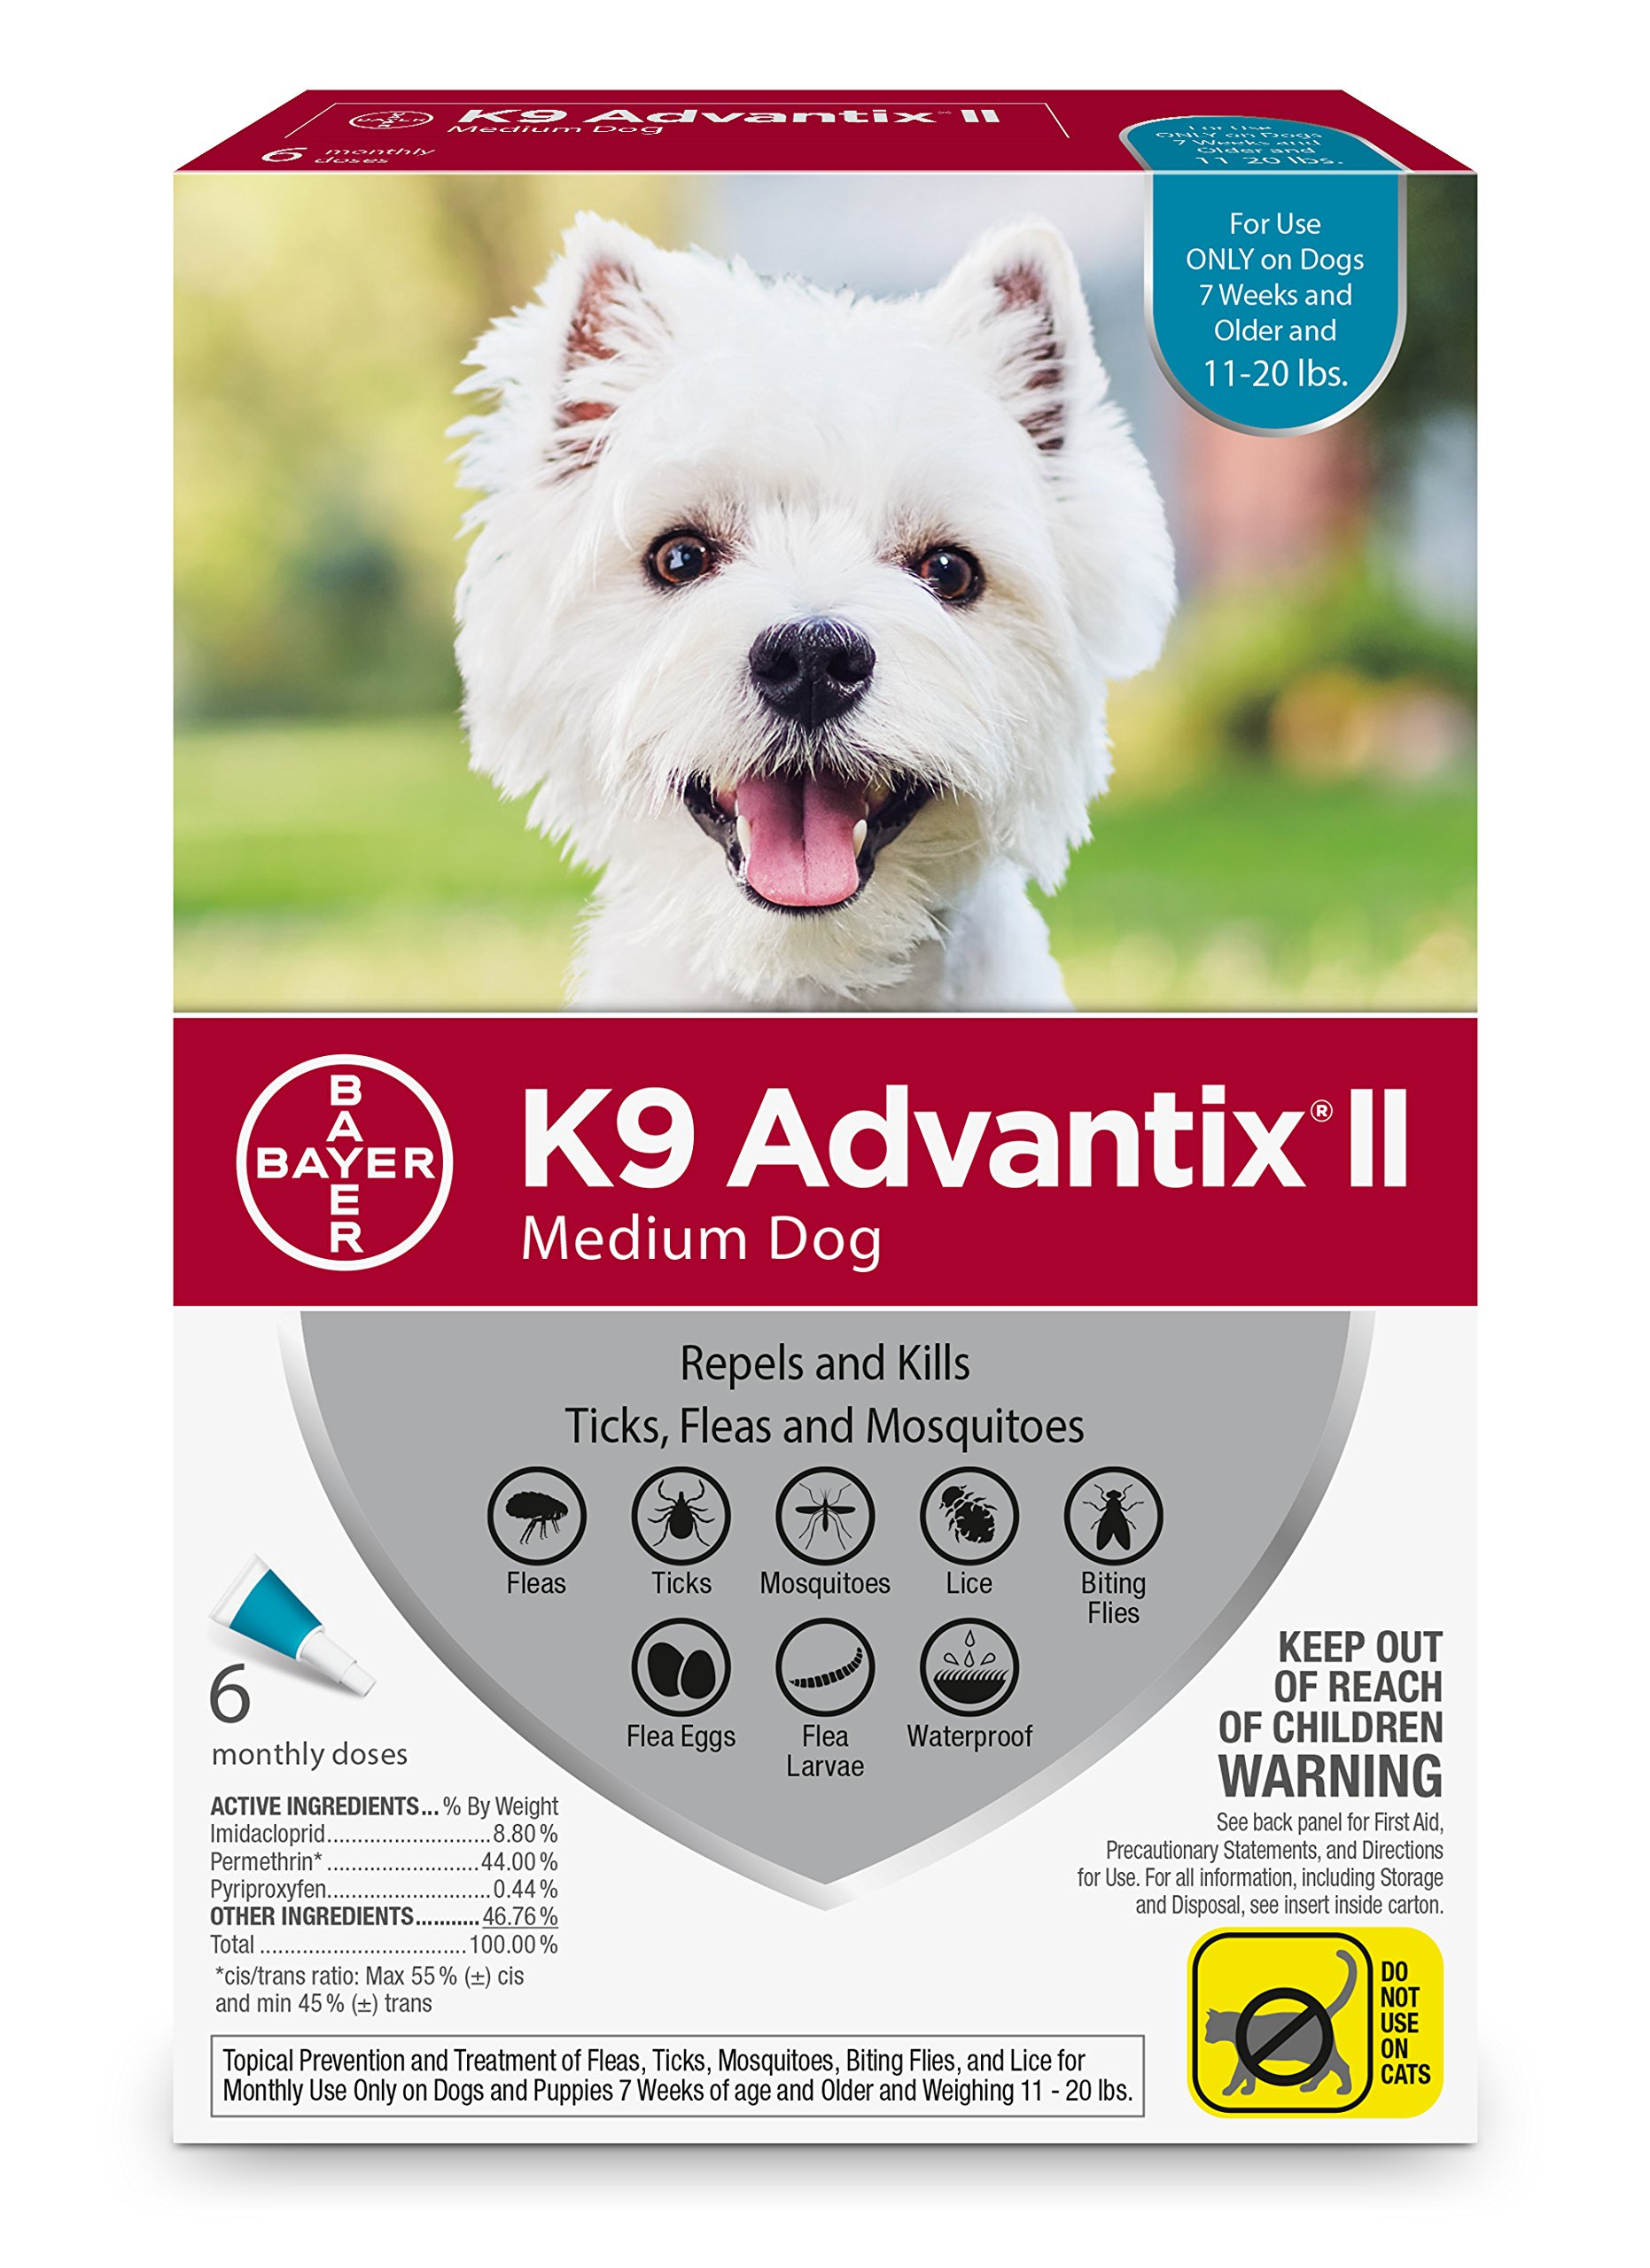 Bayer K9 Advantix II, Medium Dogs, 11 to 20-Pound, 6-Month